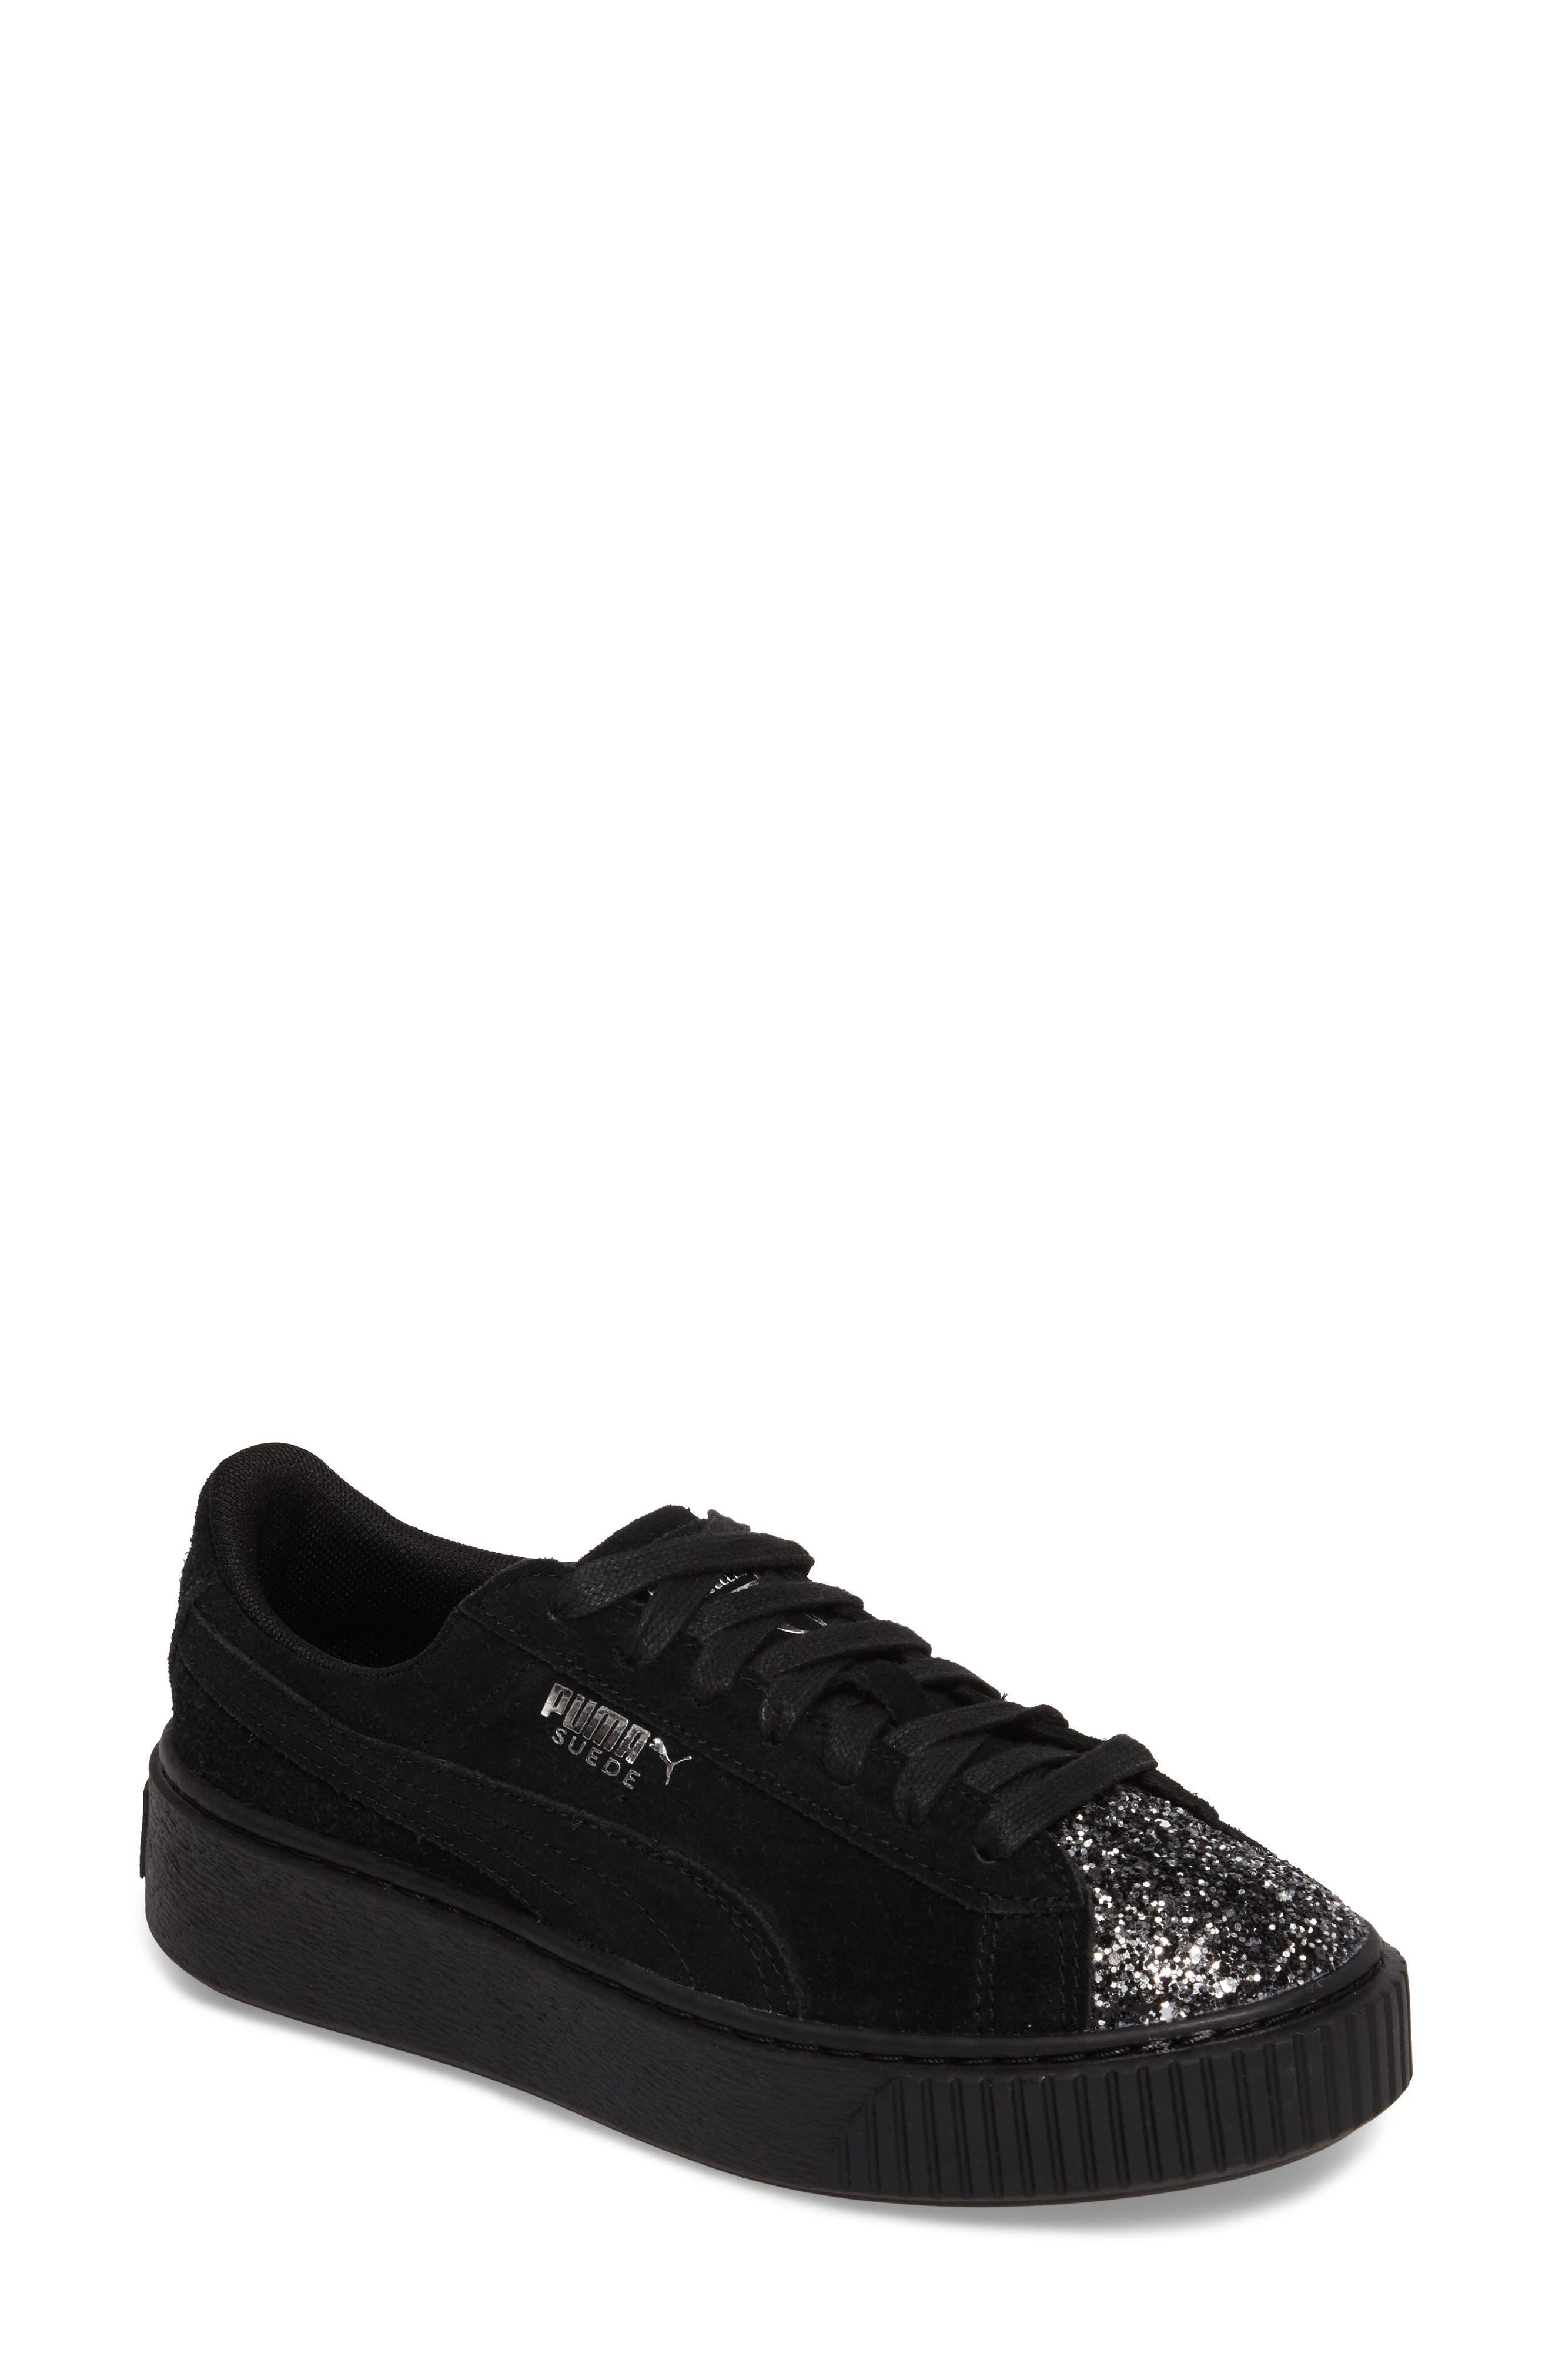 Alternate Image 1 Selected - PUMA Elemental Platform Sneaker (Women)